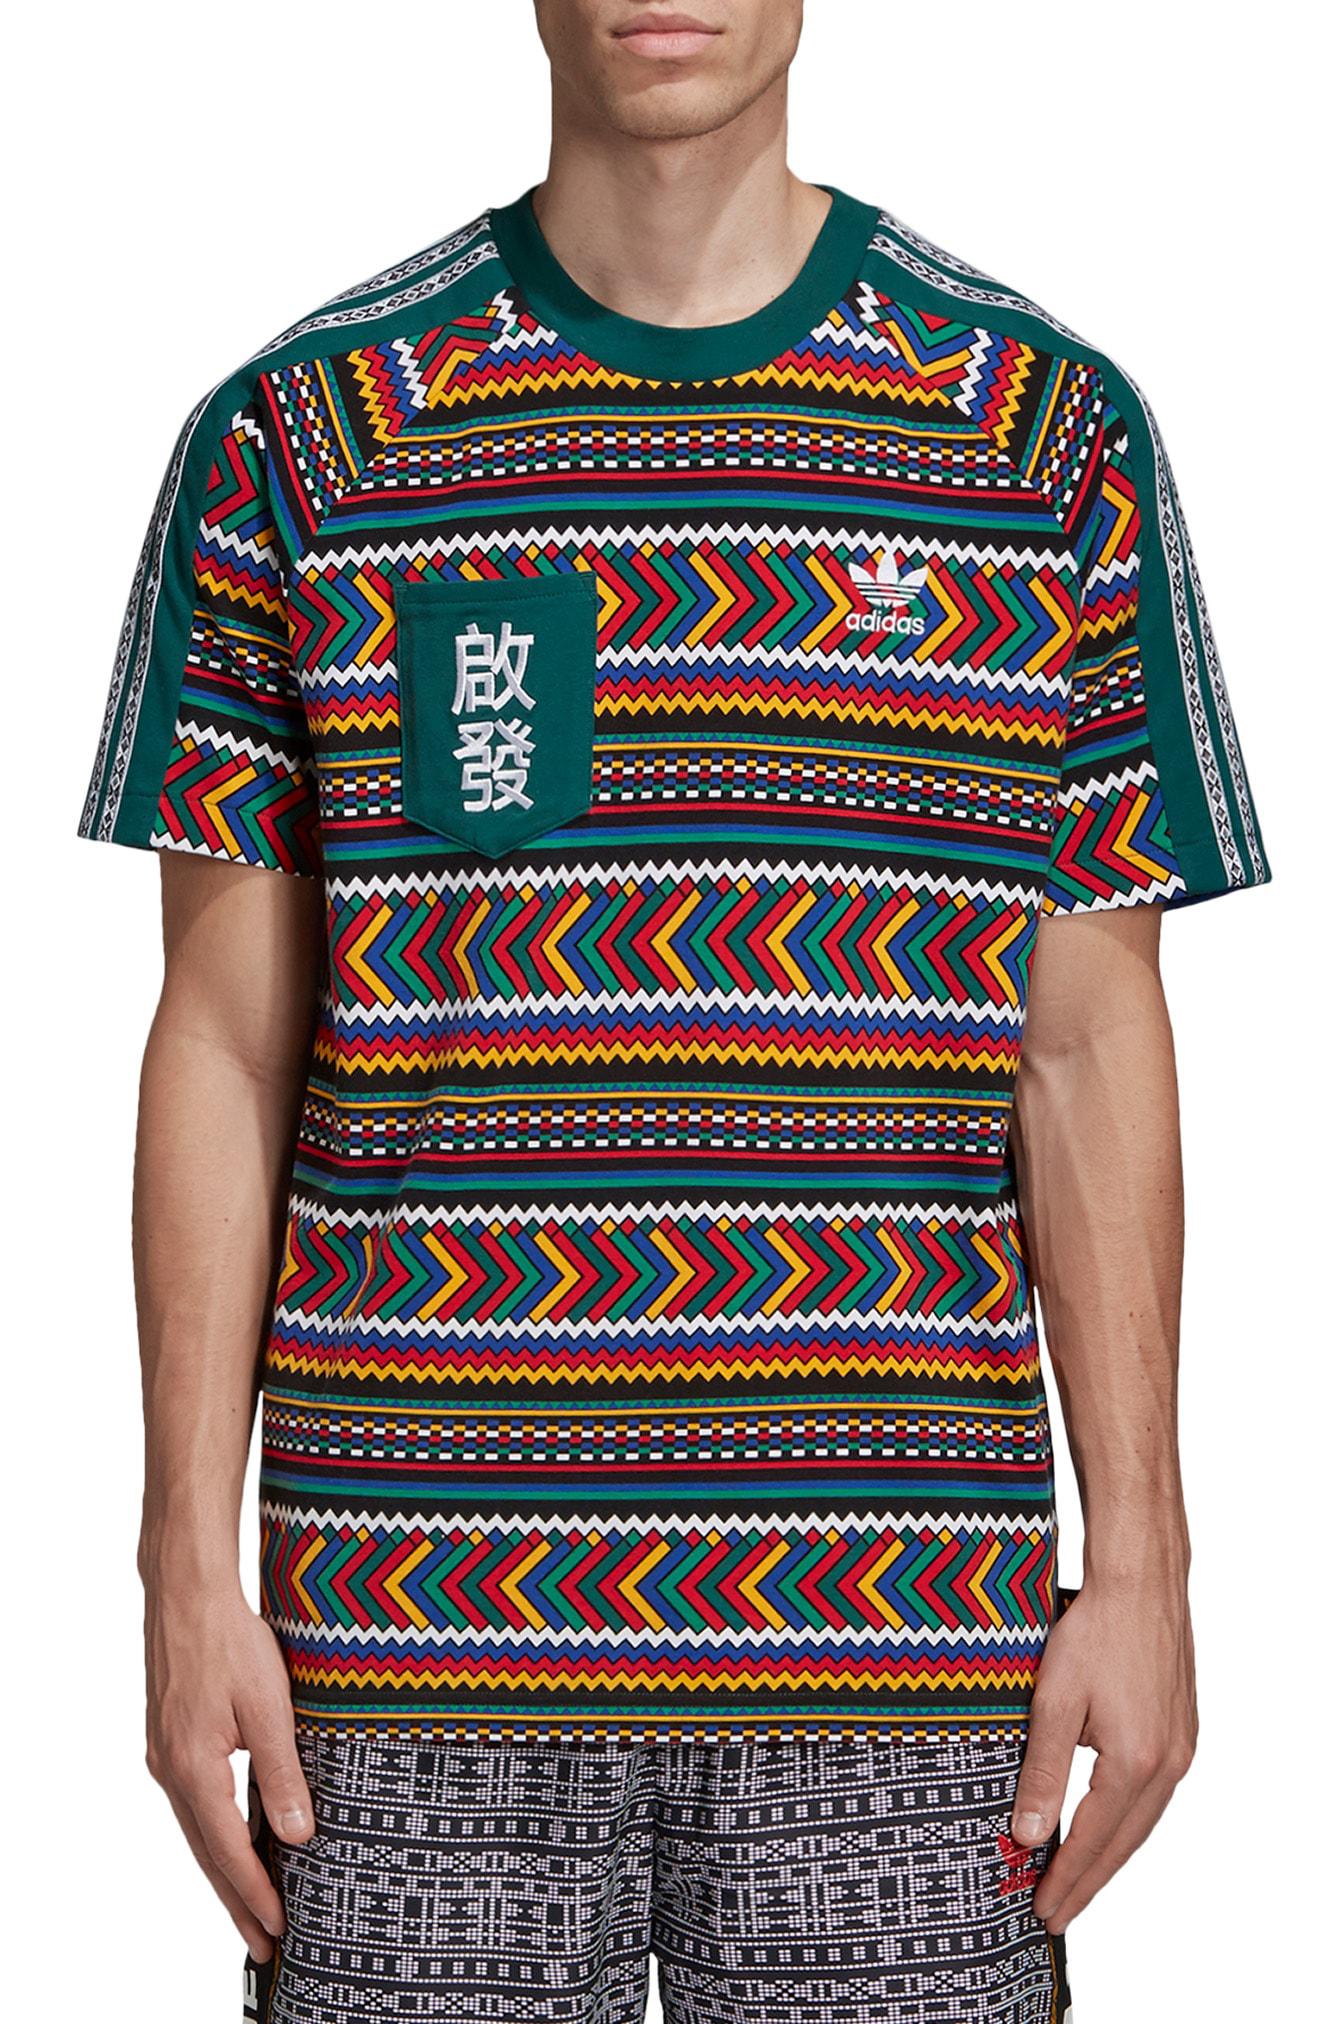 By Williams Pocket Solar Pharrell Hu Shirt T Yf6b7gvy